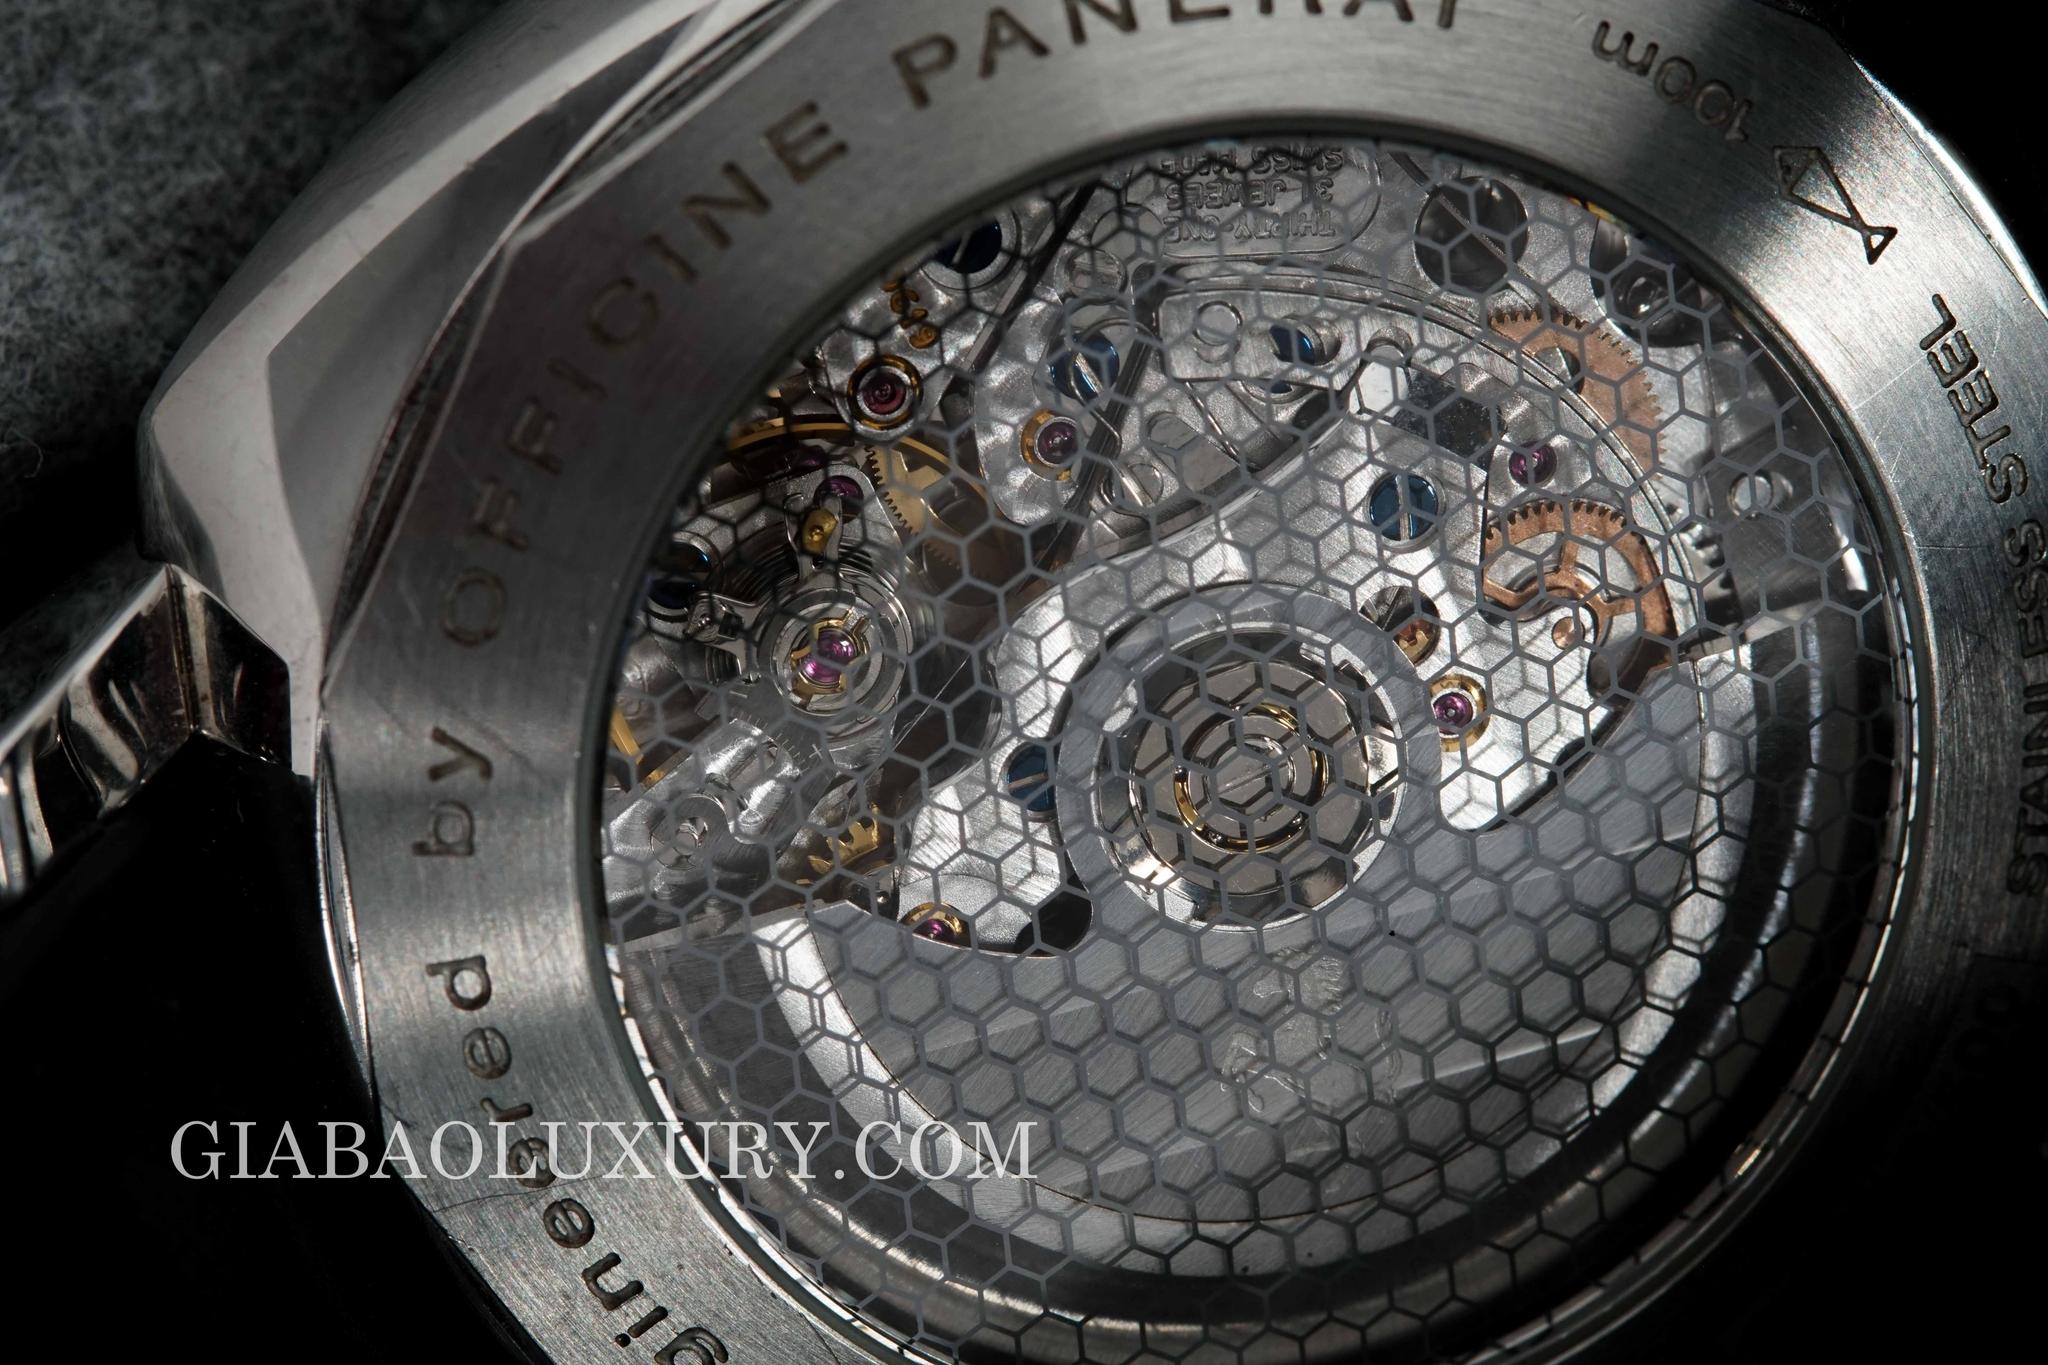 đồng hồ panerai ferrari